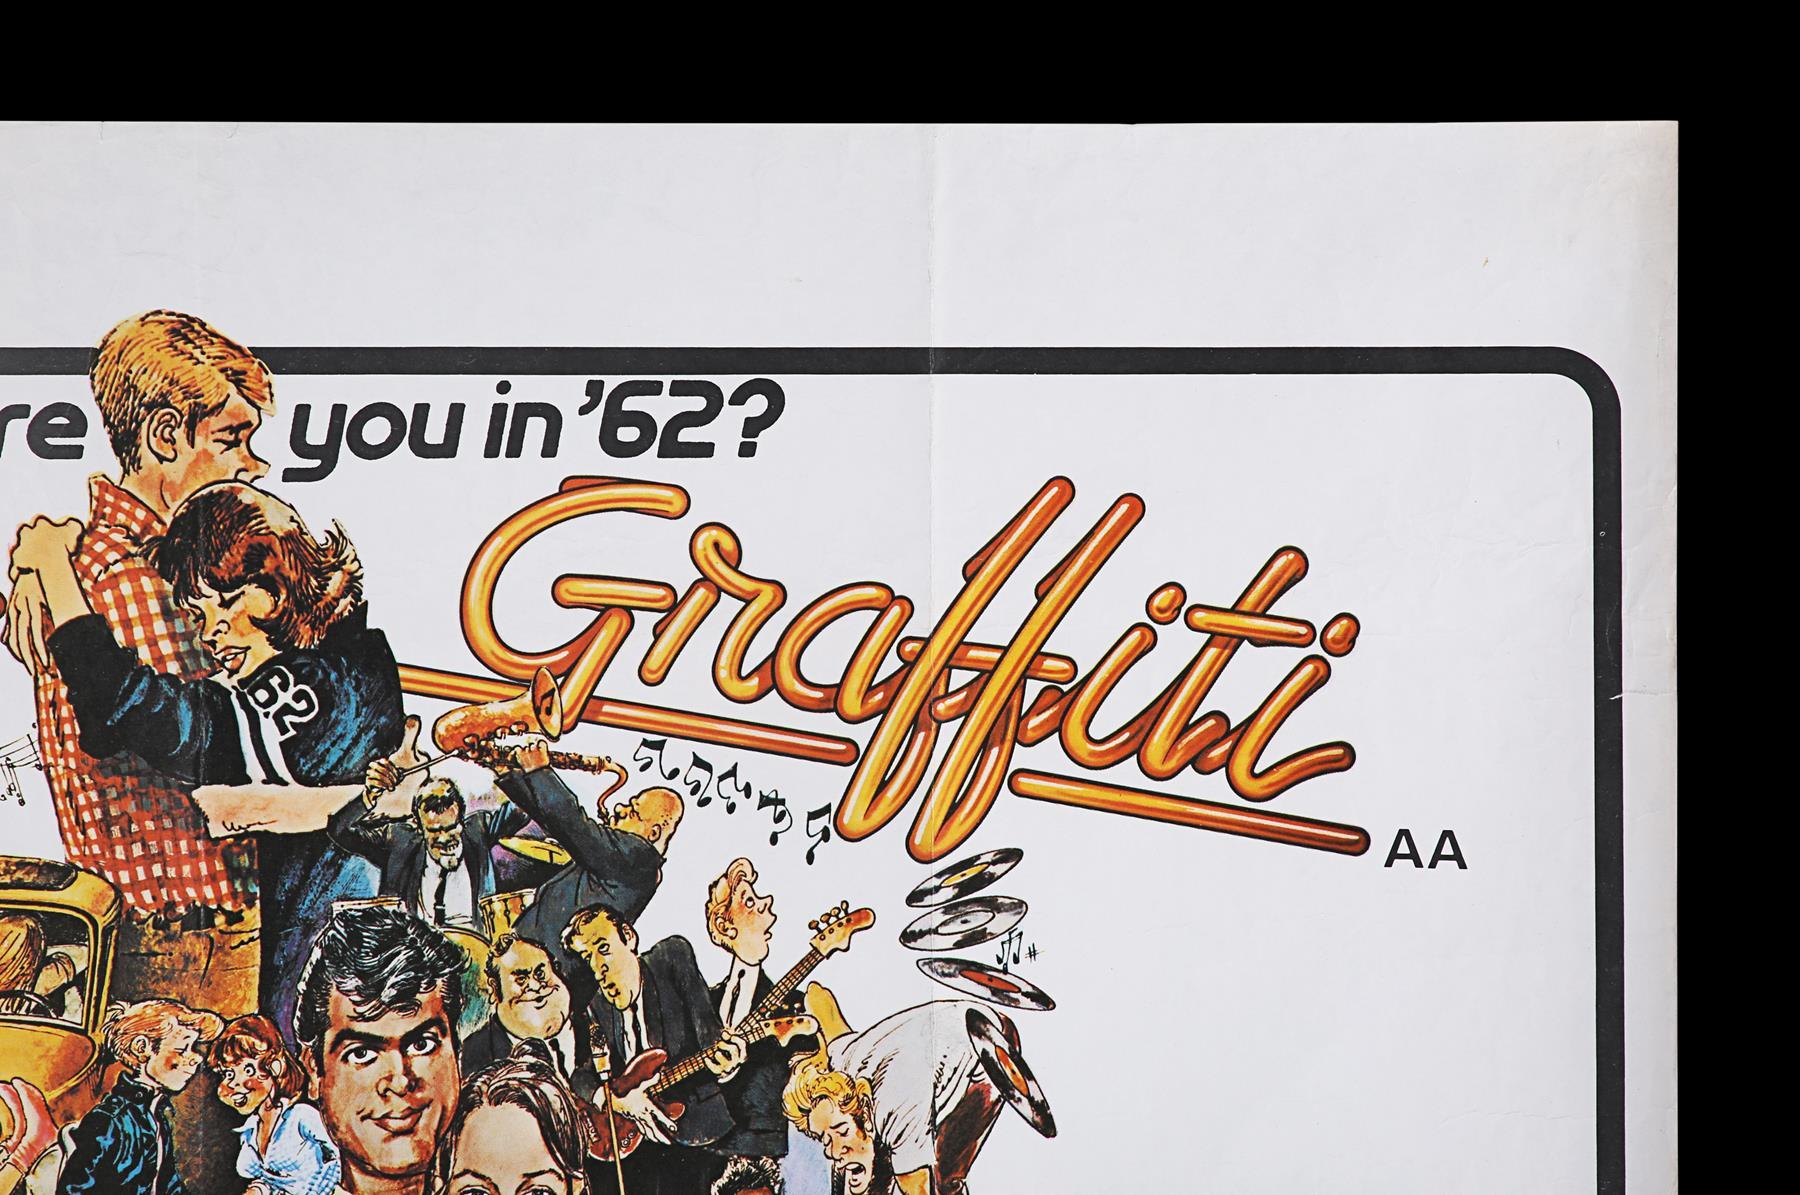 AMERICAN GRAFFITI (1973) - UK Quad, 1973 - Image 3 of 6